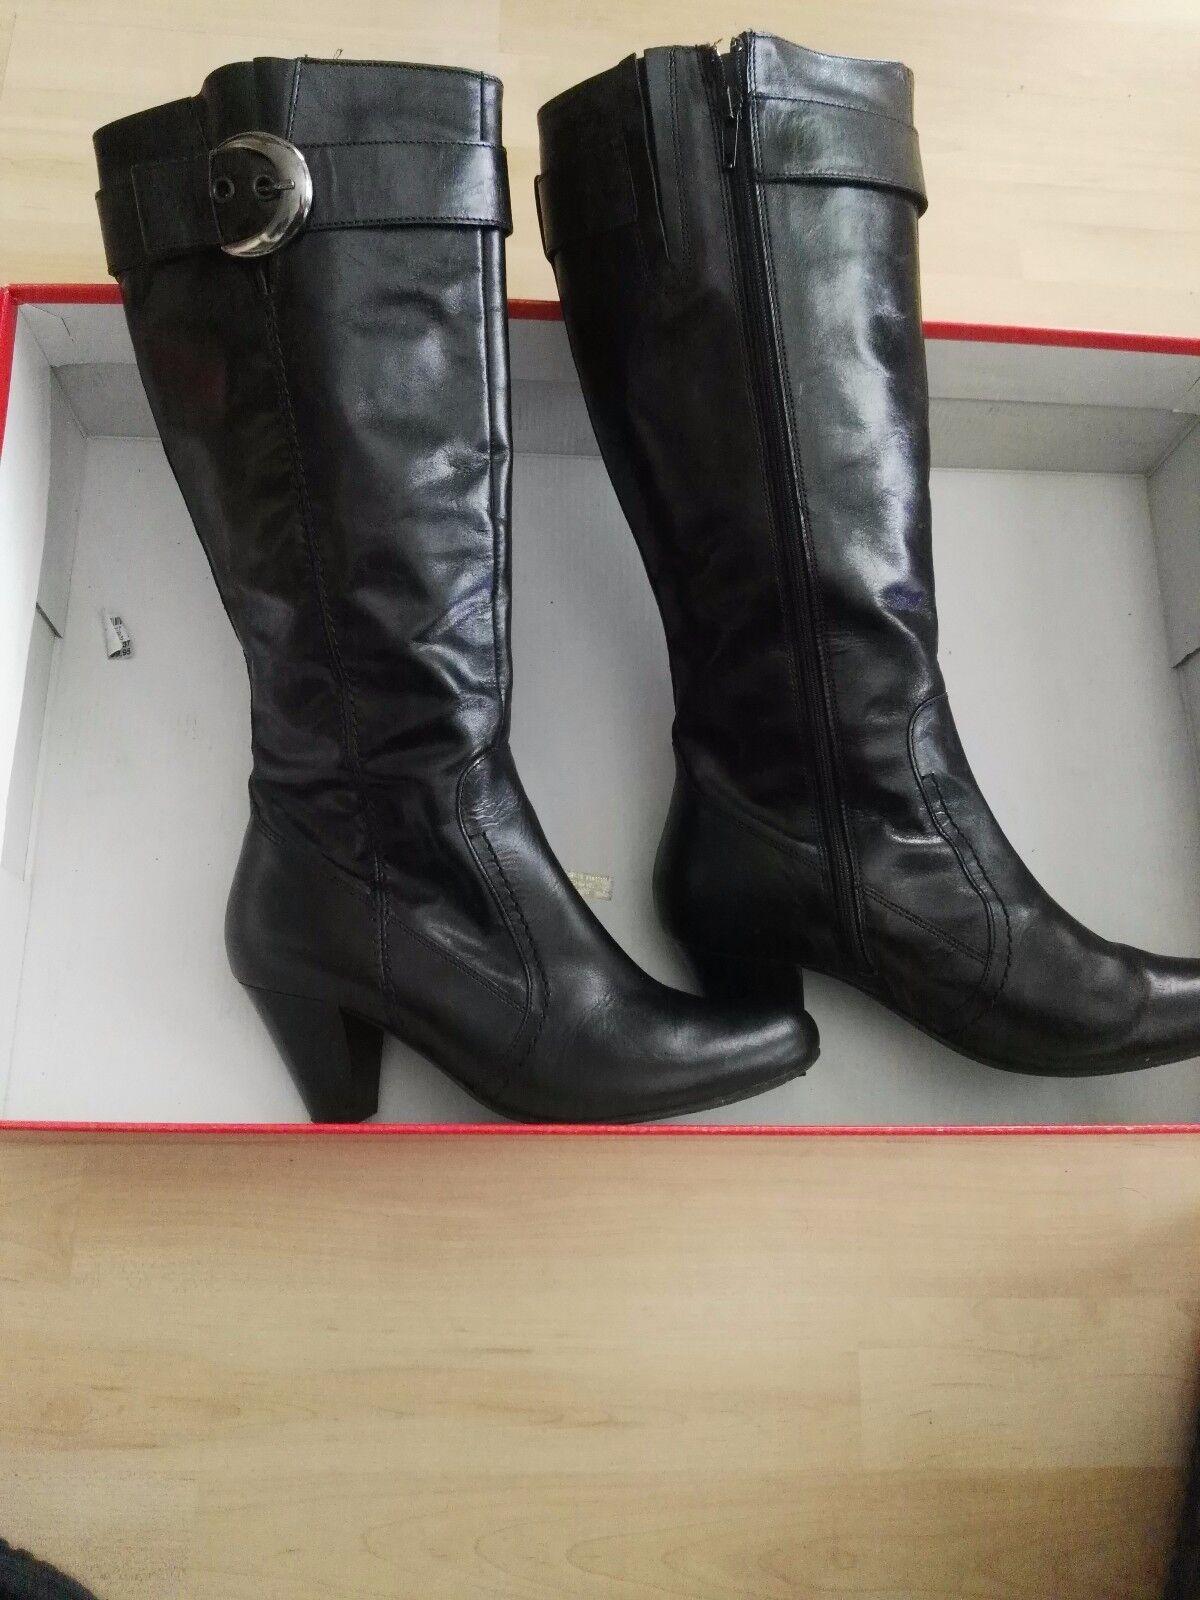 Damenschuhe Stiefel Damenstiefel Lederstiefel Echt Leder Neu 37